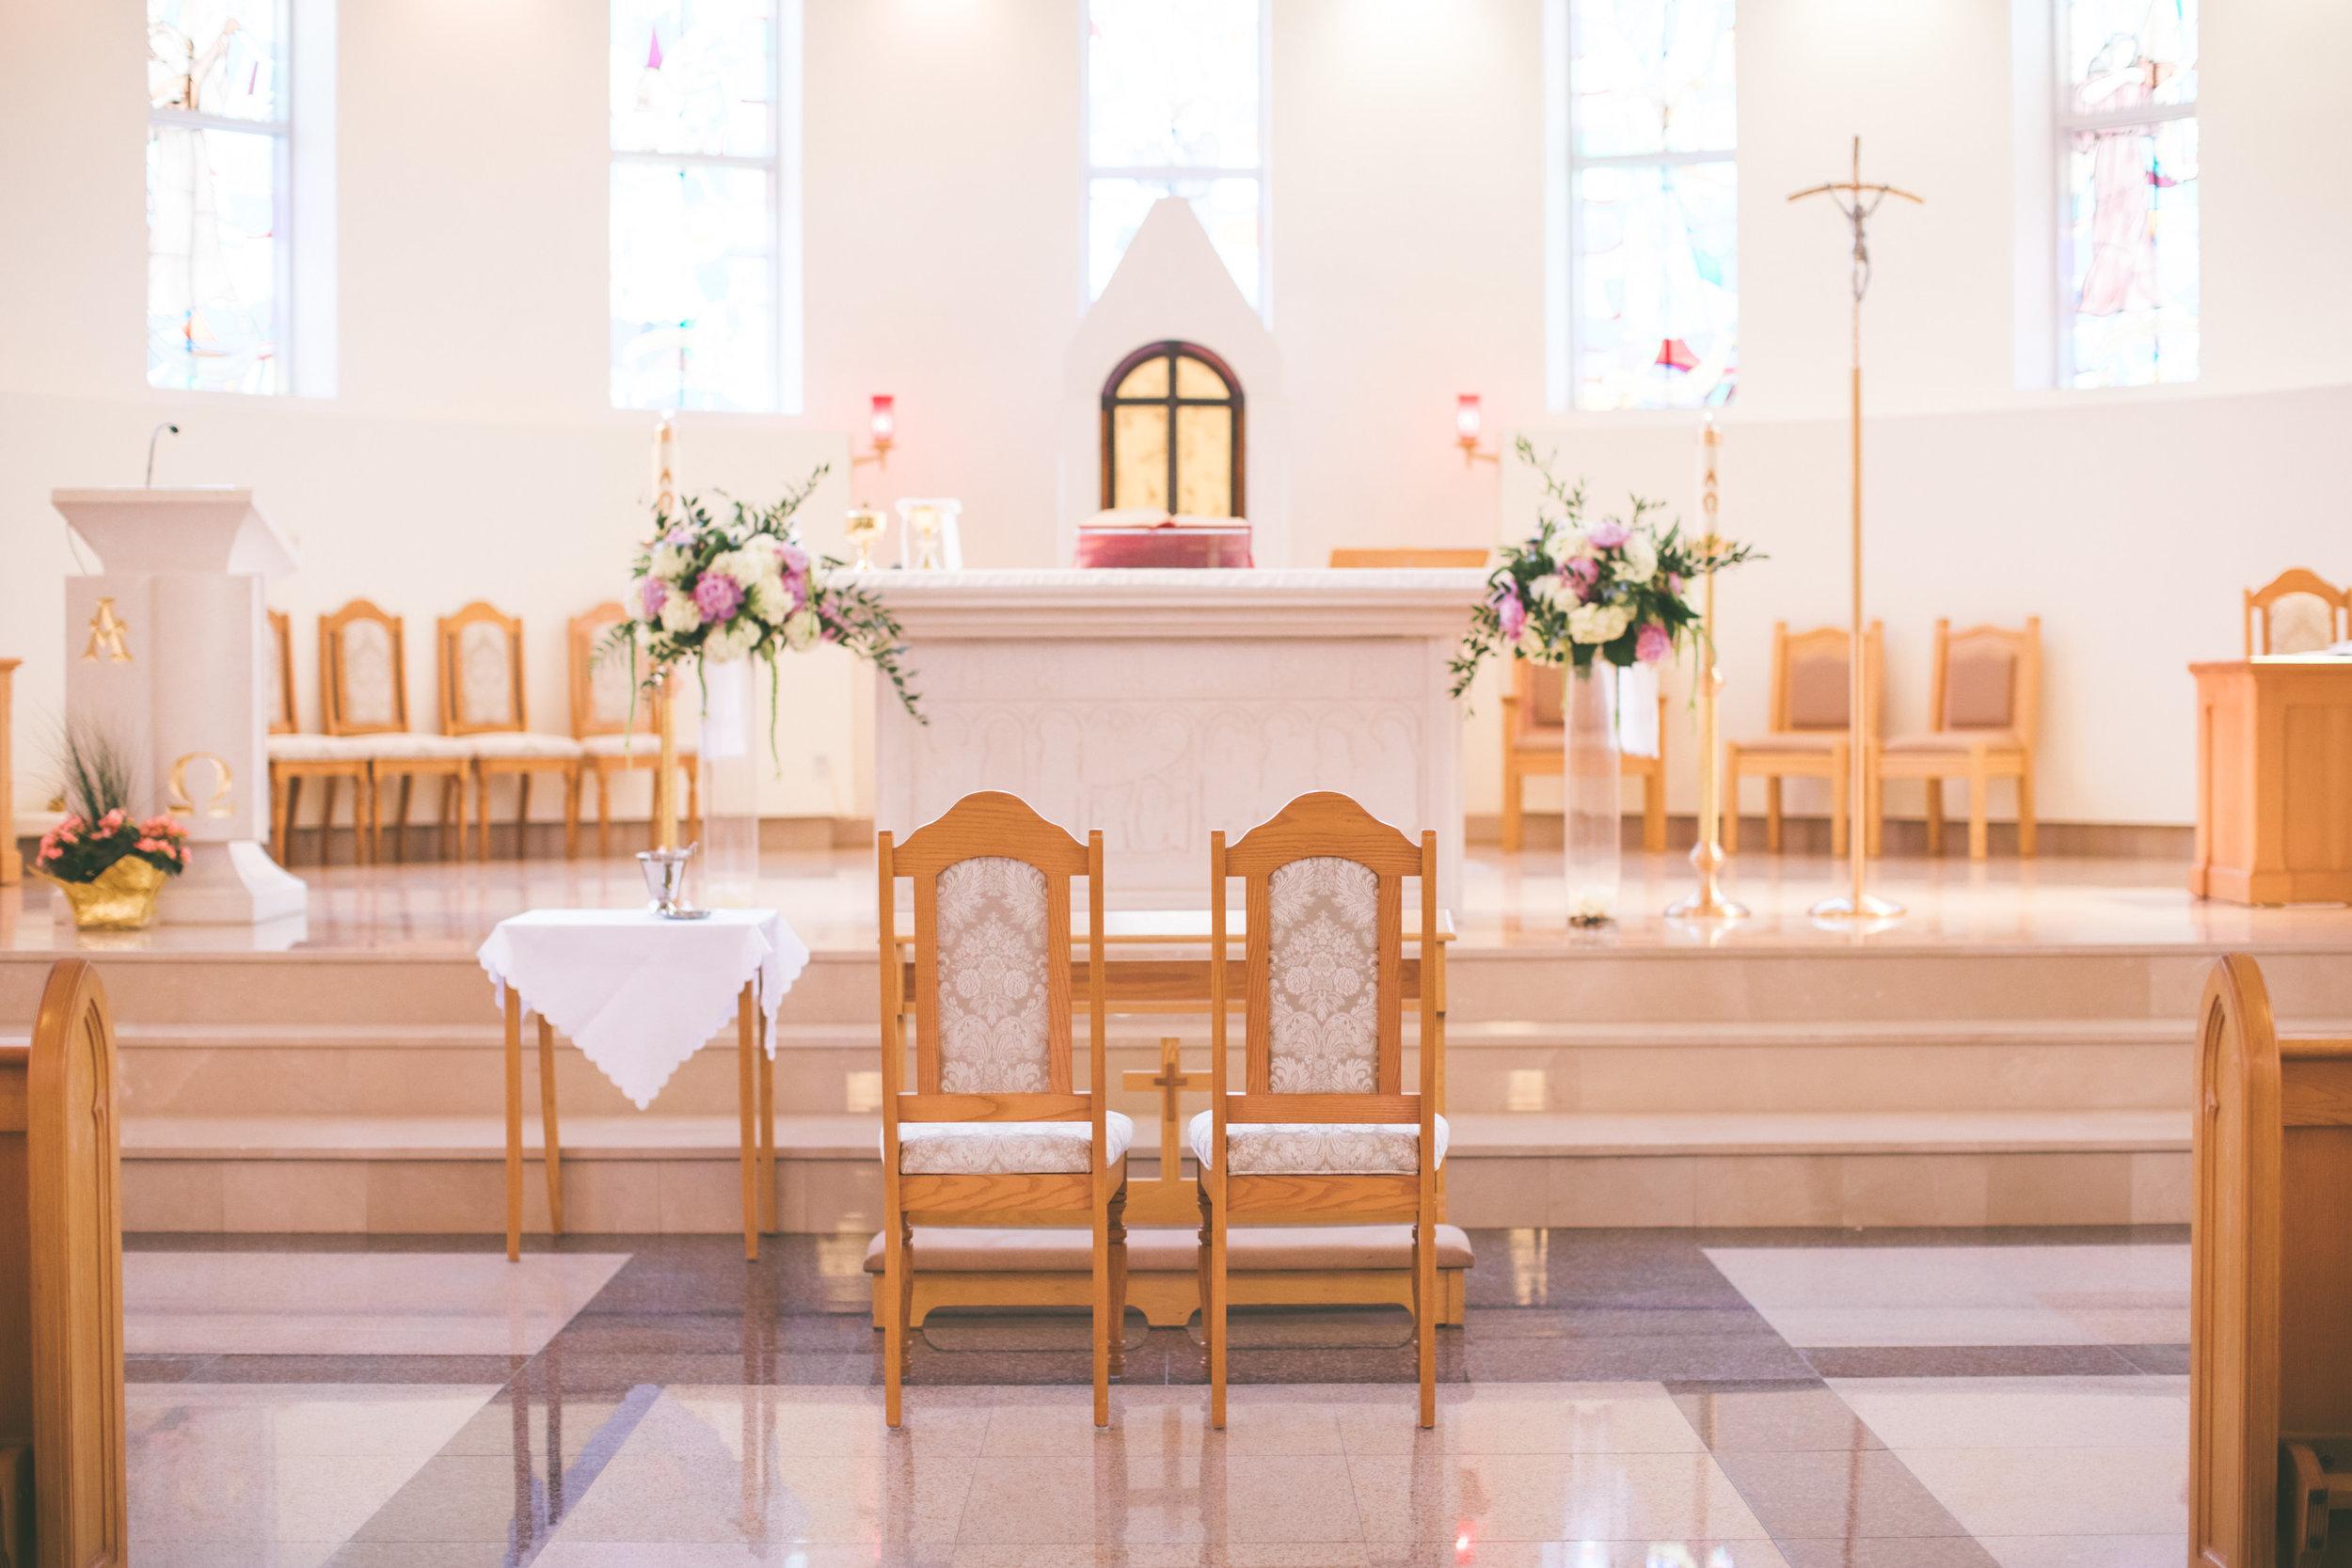 ashley___dario_wedding___lifesreel_danielcaruso___0620.jpg